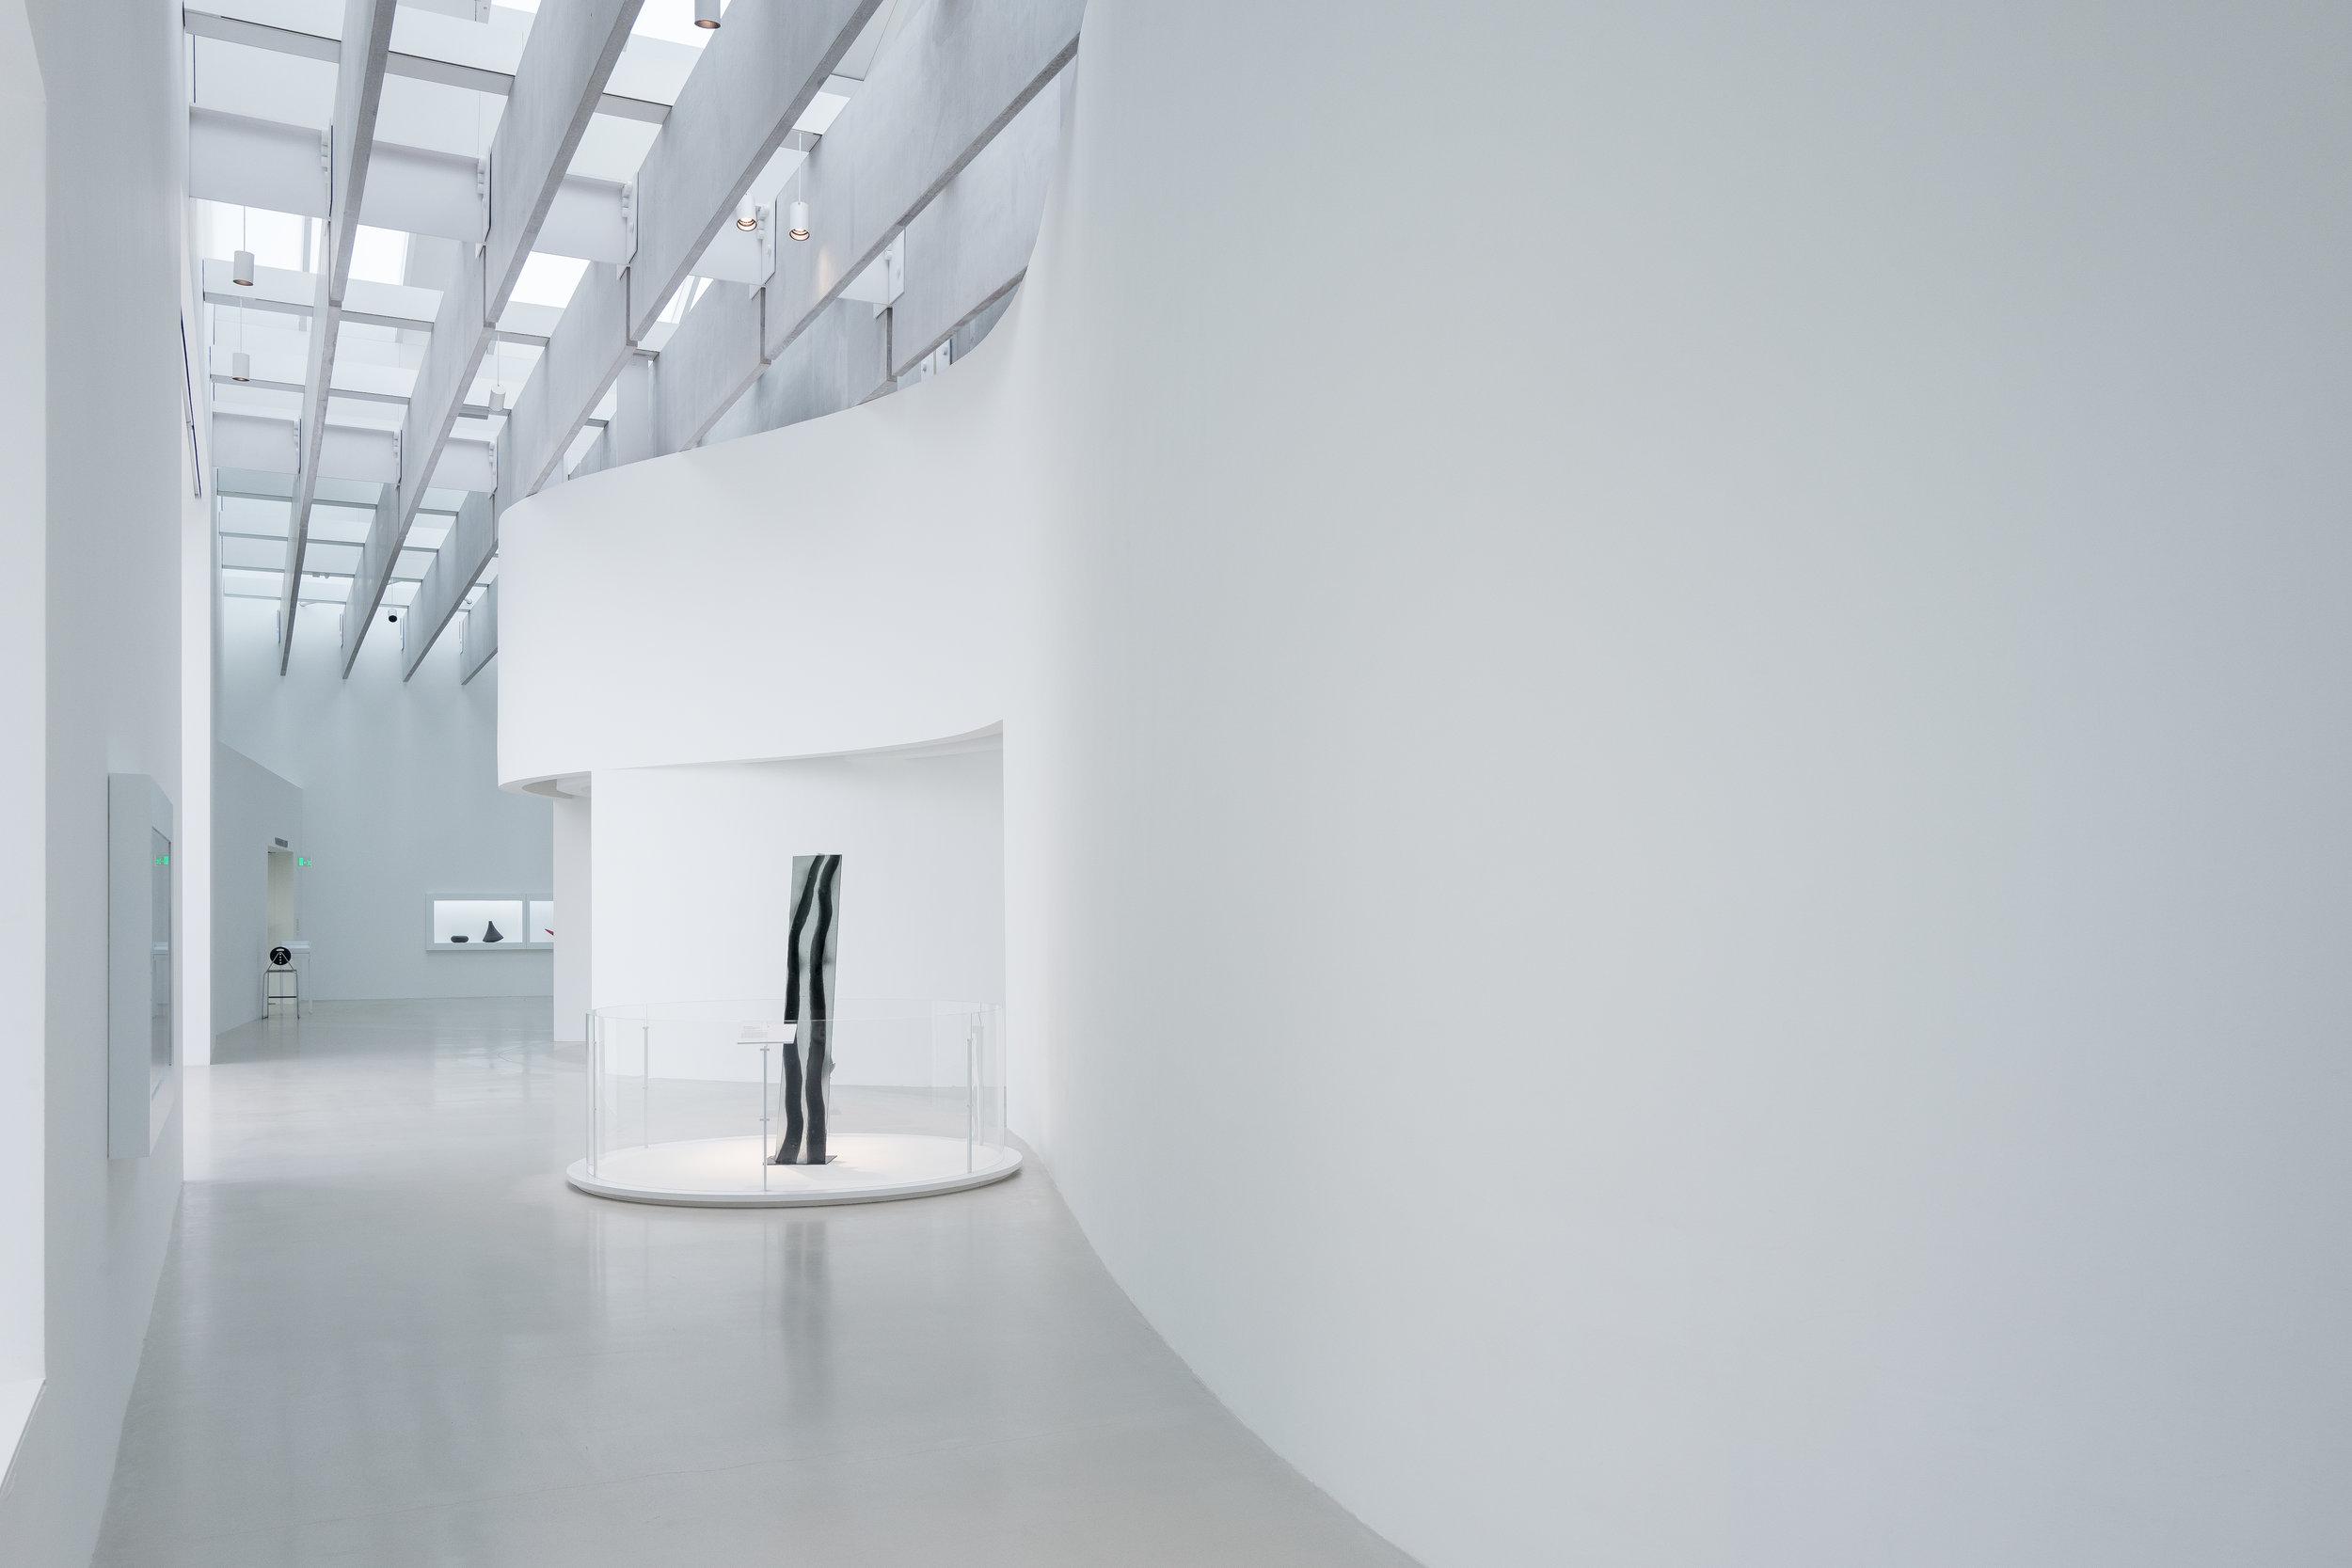 ramsey bakhoum - architectural photographer - corning museum (1 of 1)-20.jpg